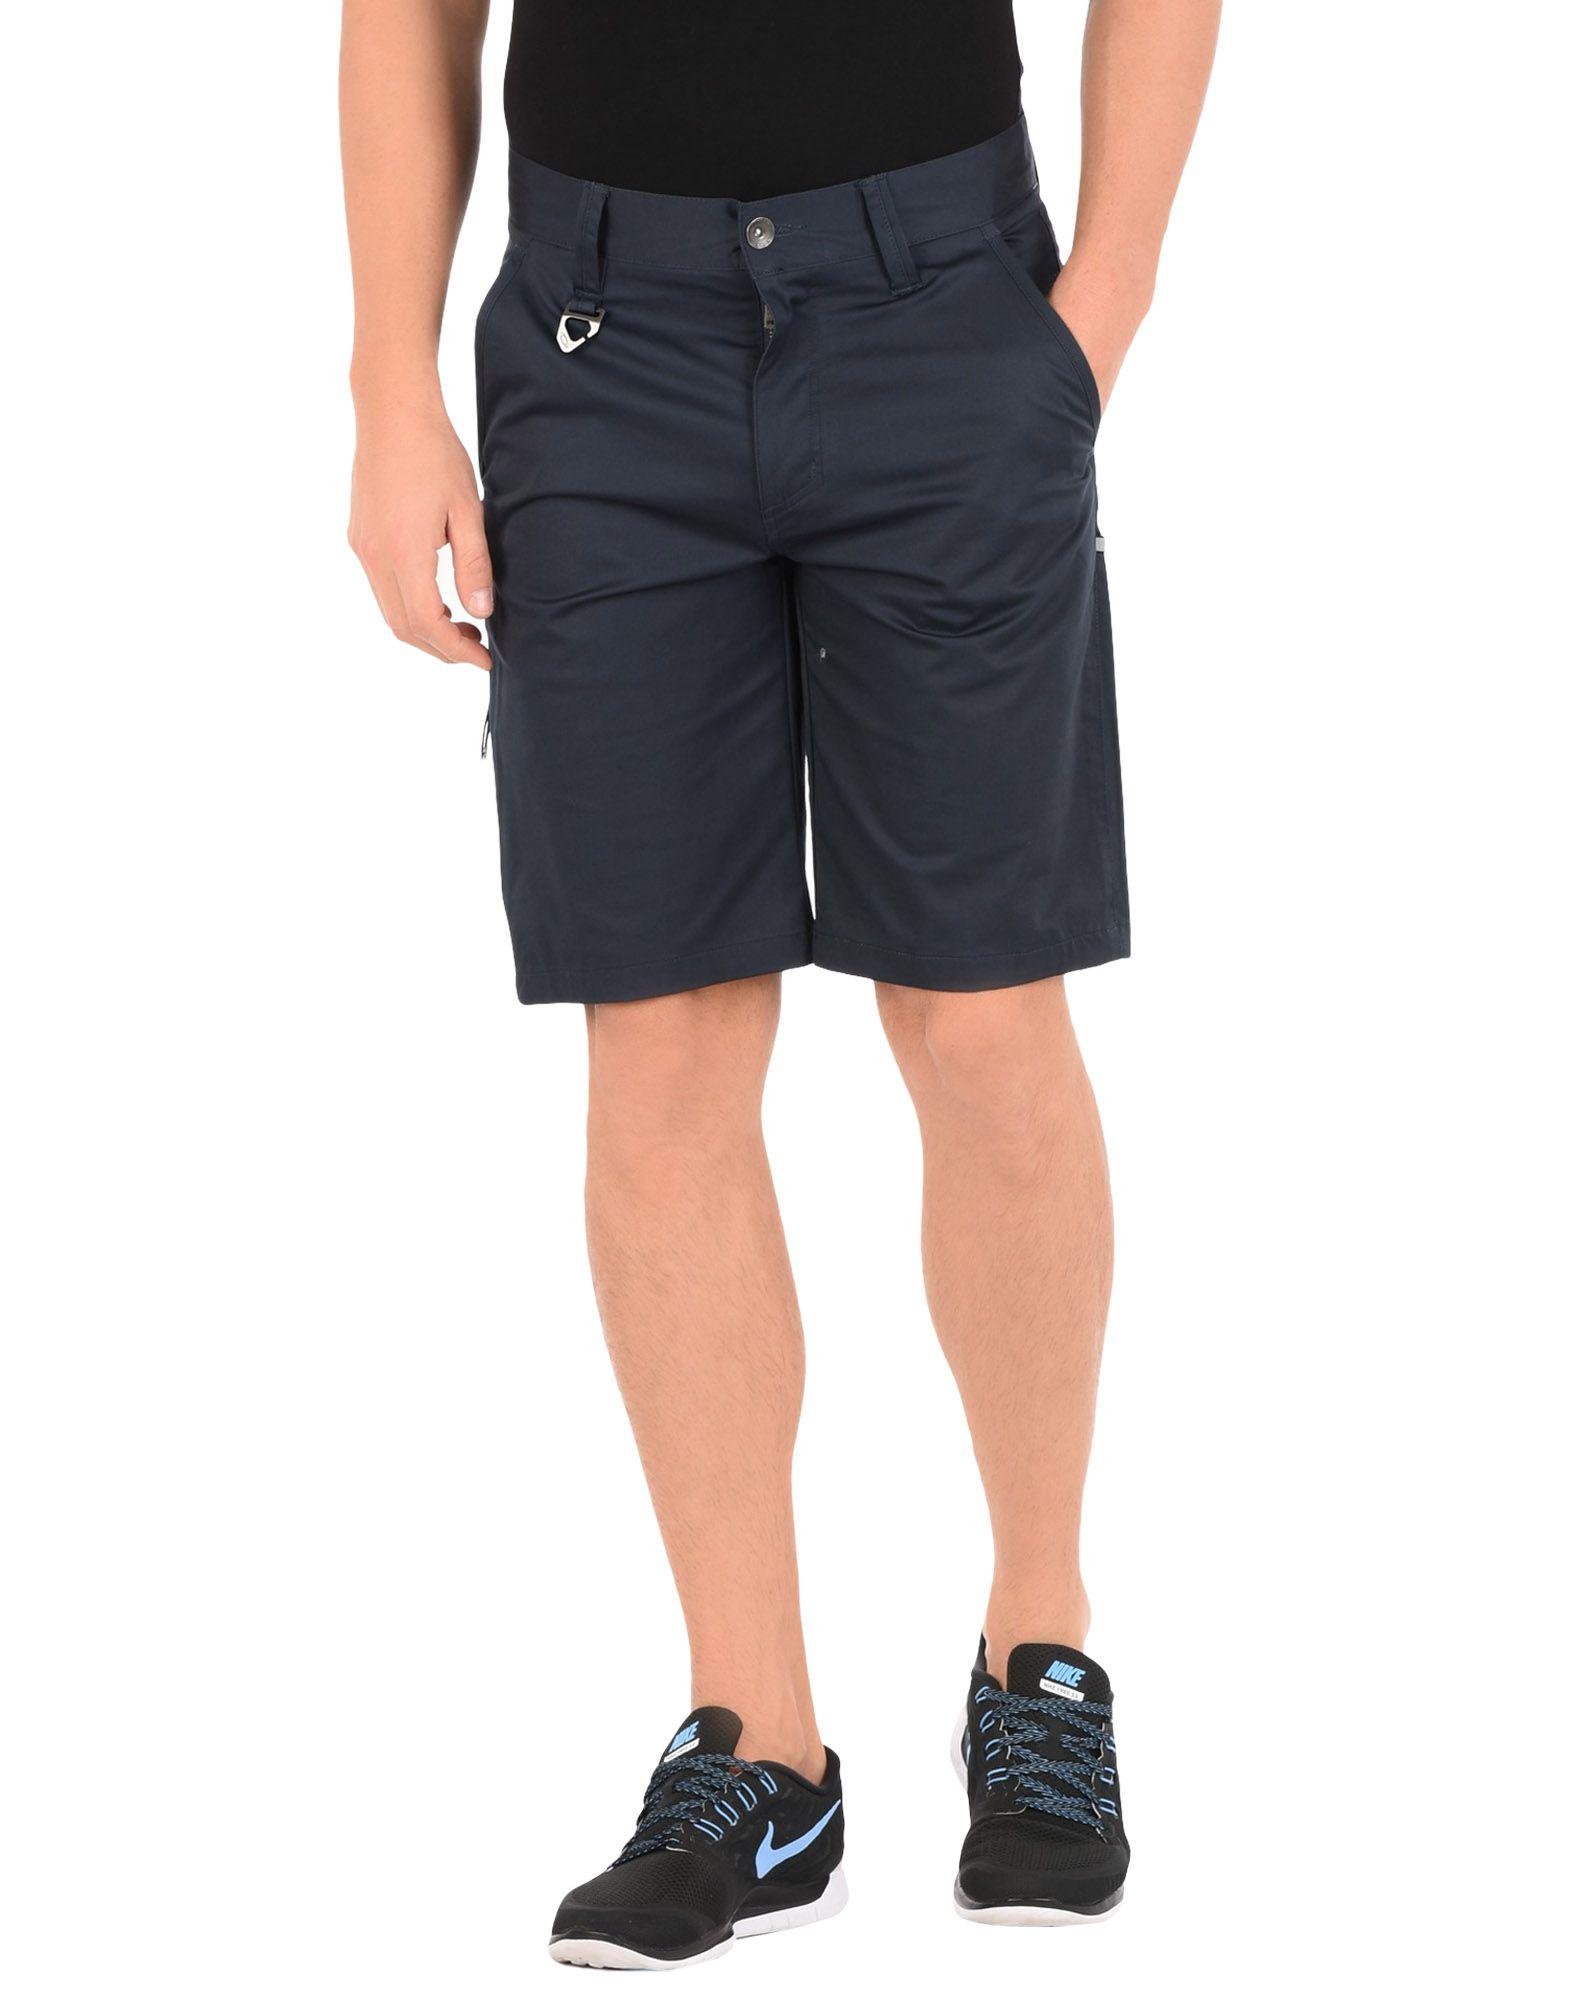 réflexions sur magasin britannique Bons prix OAKLEY Shorts & Bermuda - Trousers U | YOOX.COM